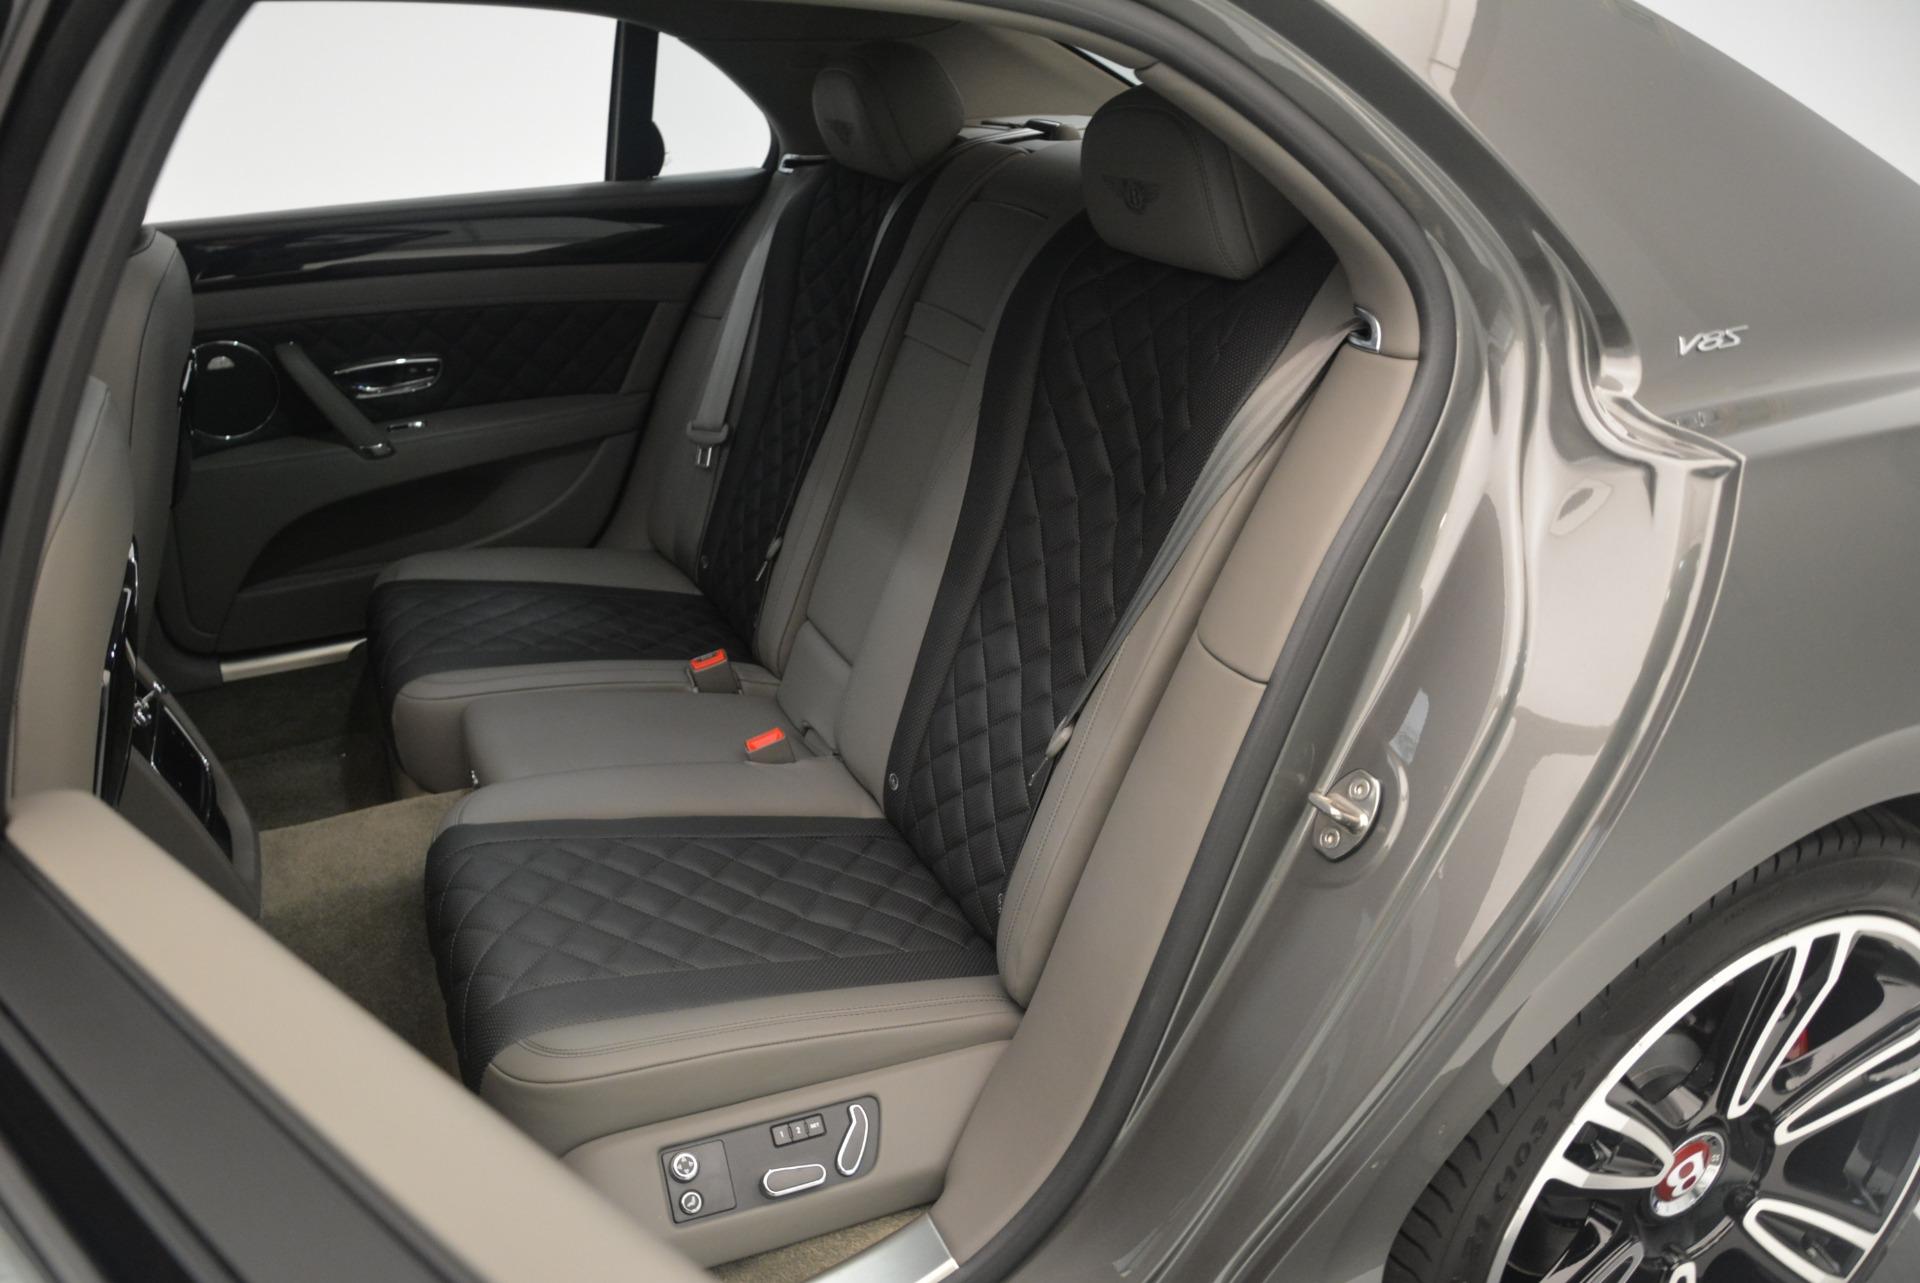 Used 2017 Bentley Flying Spur V8 S For Sale In Westport, CT 2263_p30